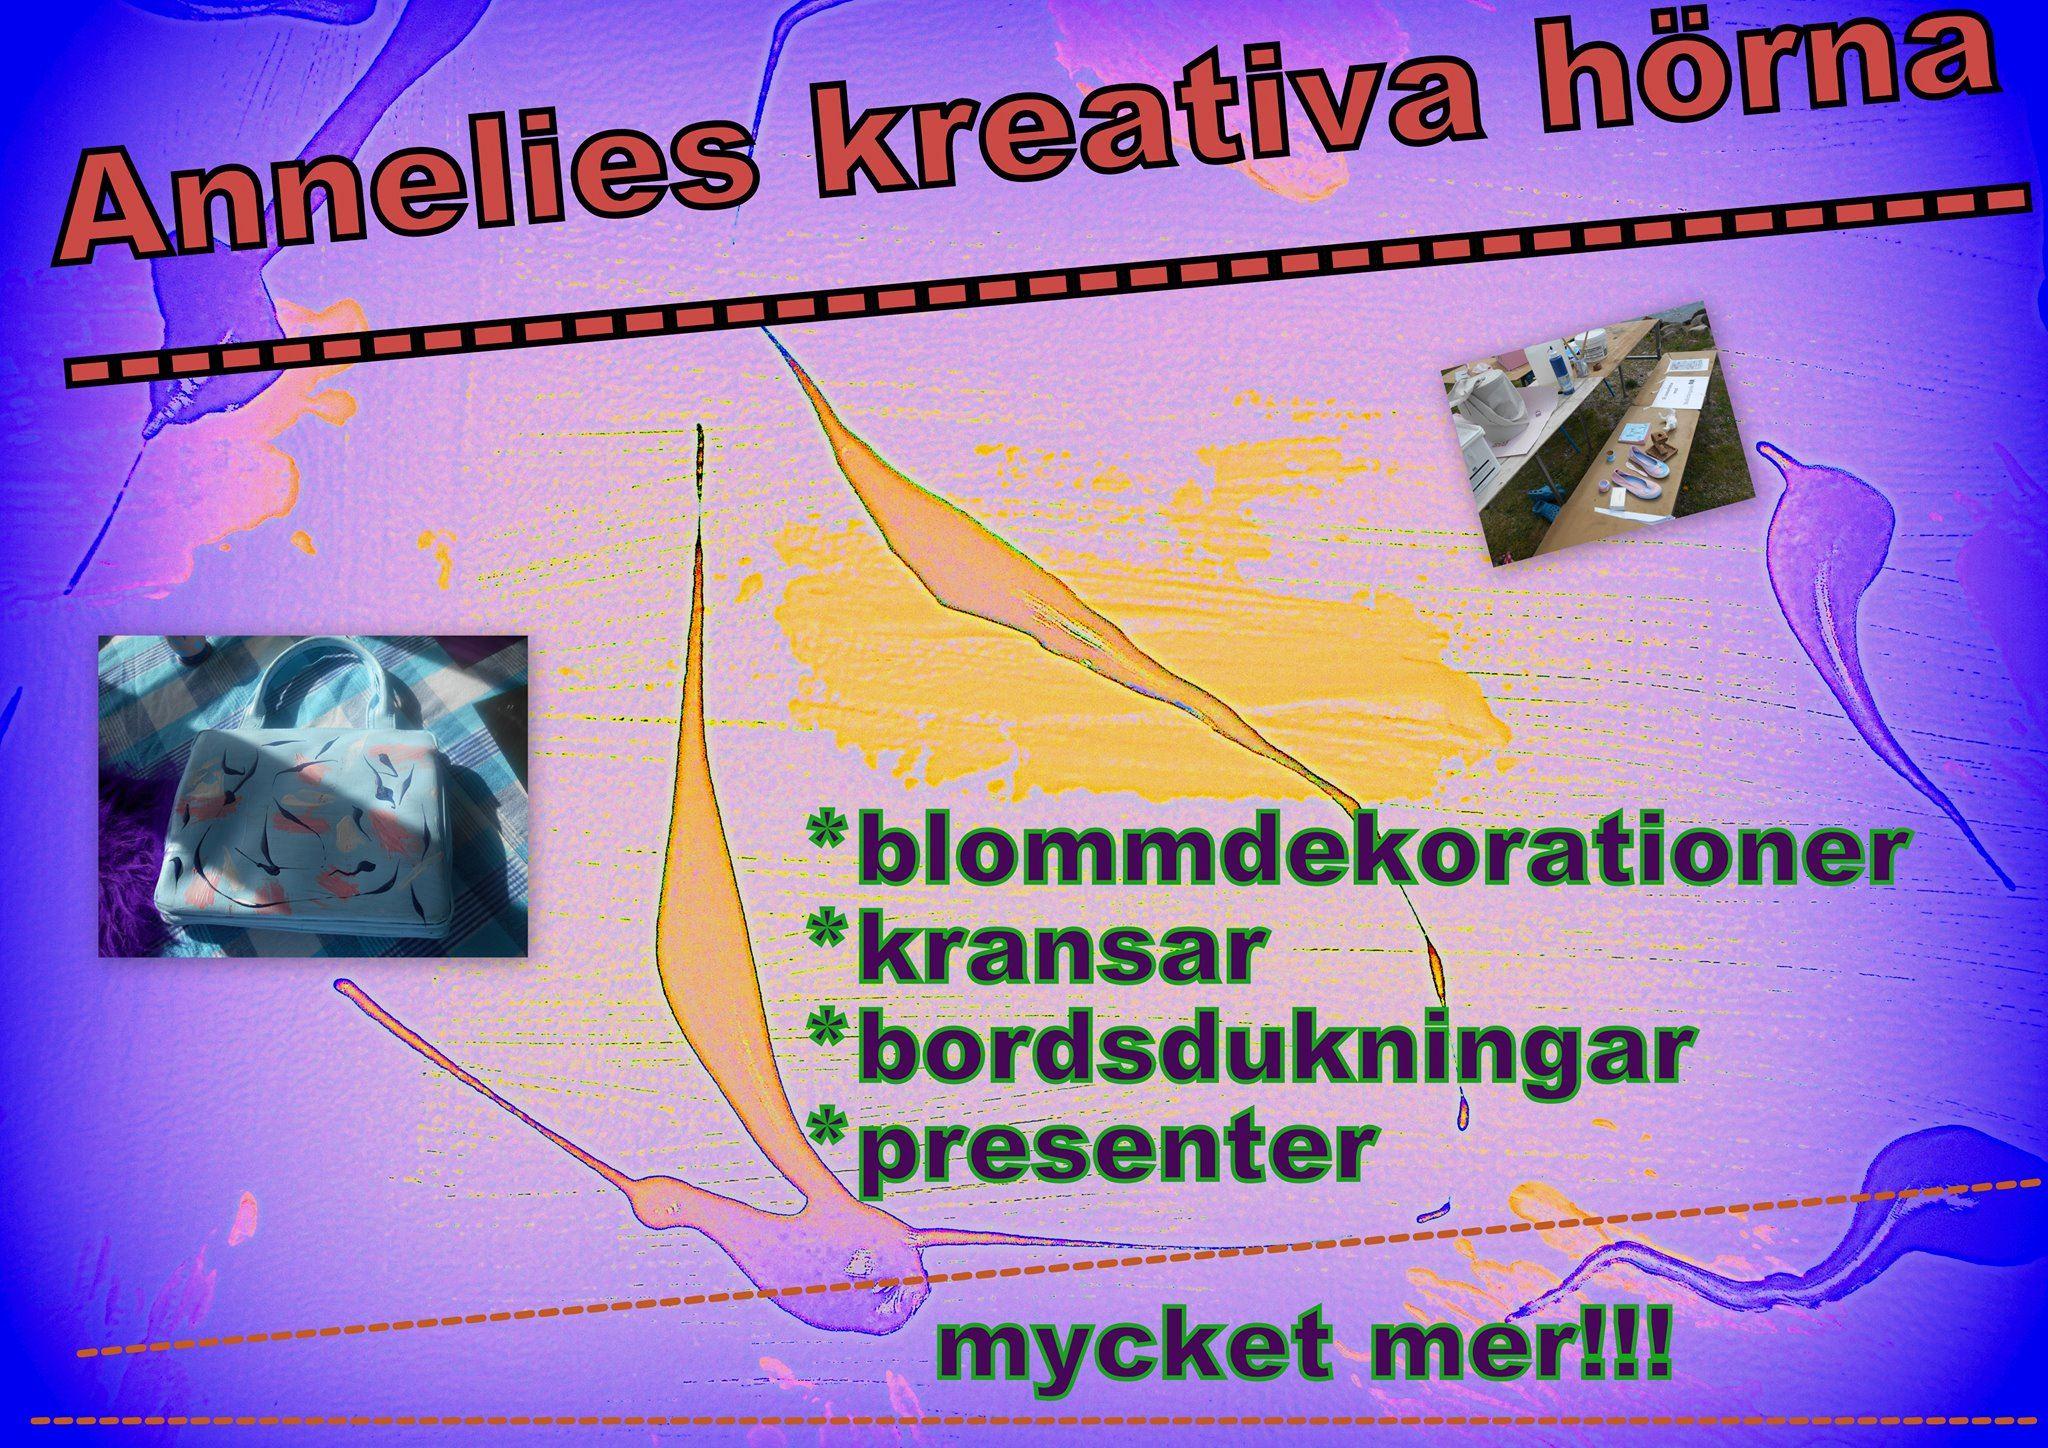 Annelies Kreativa Hörna